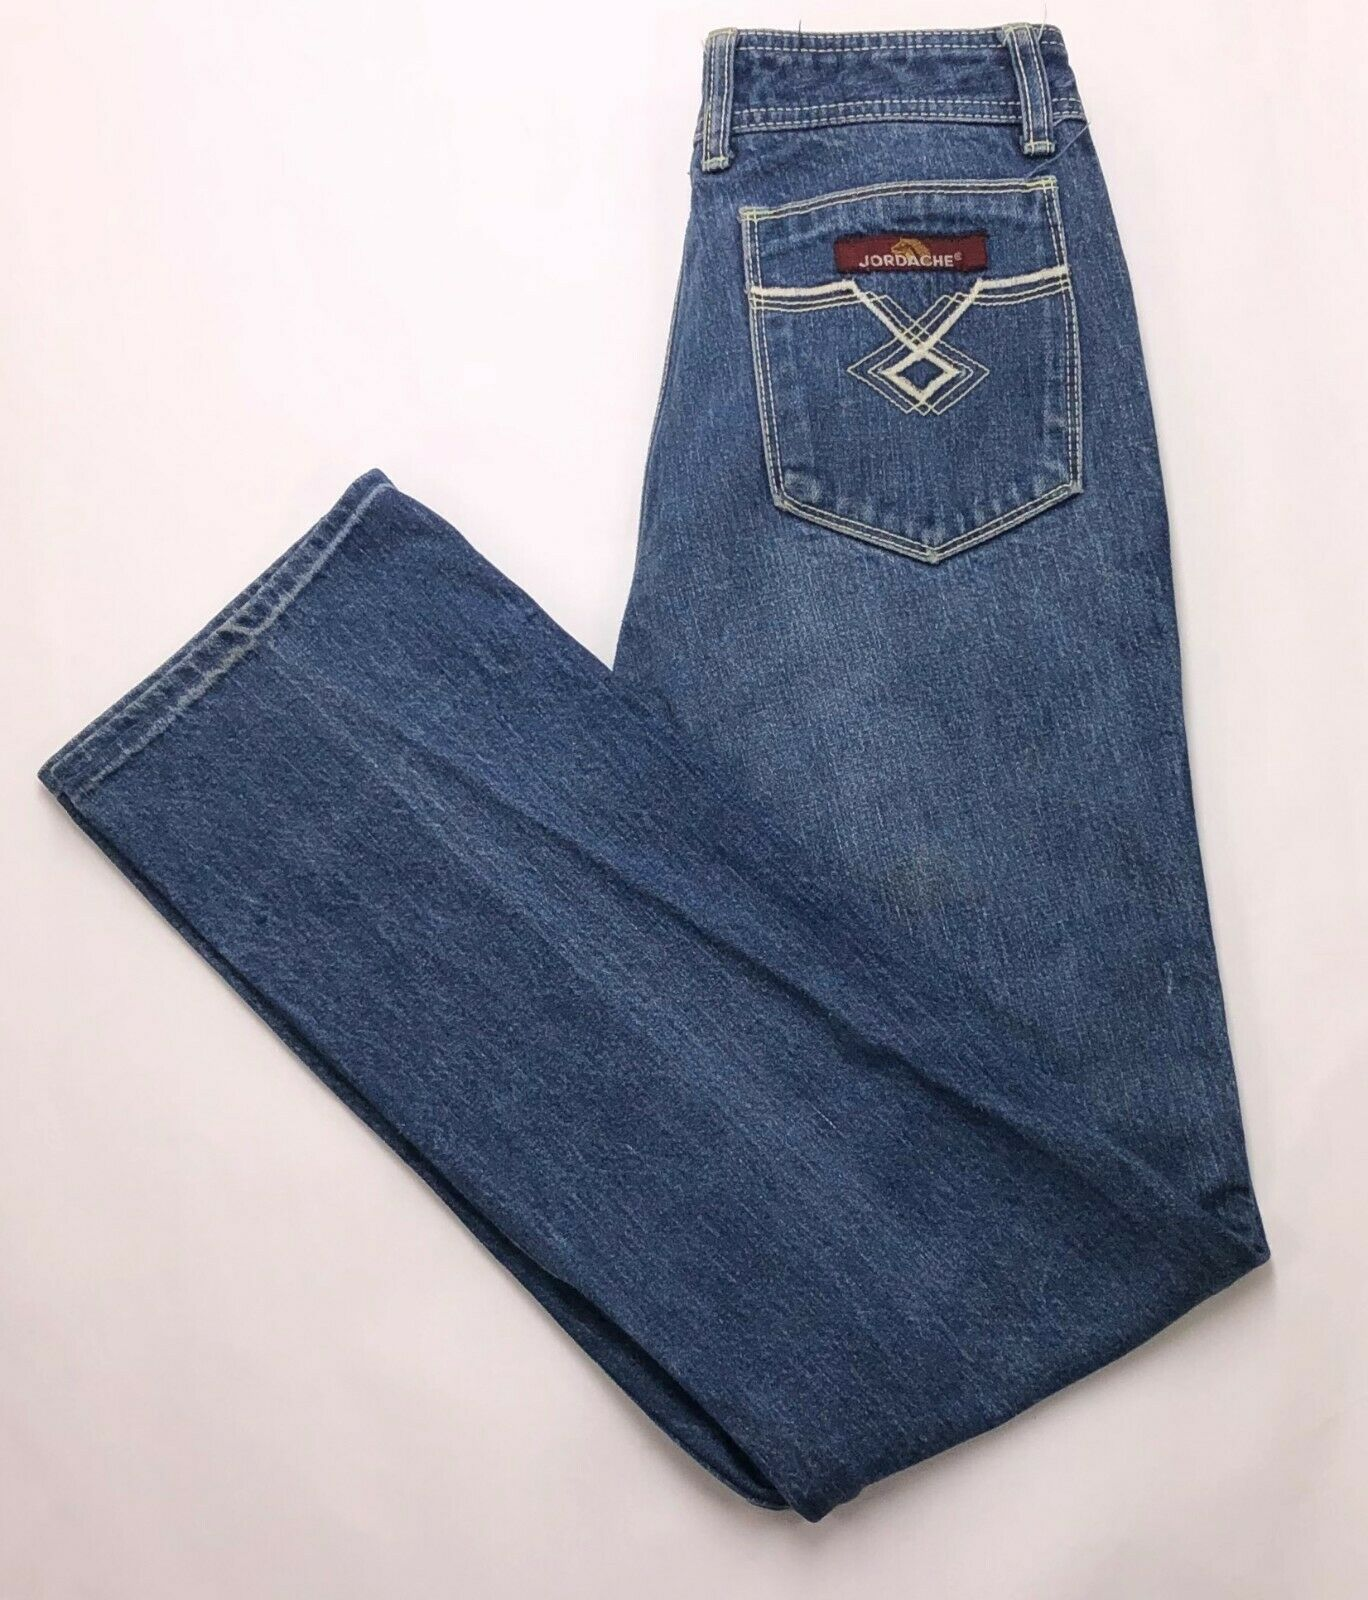 K206 VTG Jordache High Rise Straight Boyfriend Mom Jeans sz 30 (Mea 26x29.5 hem)